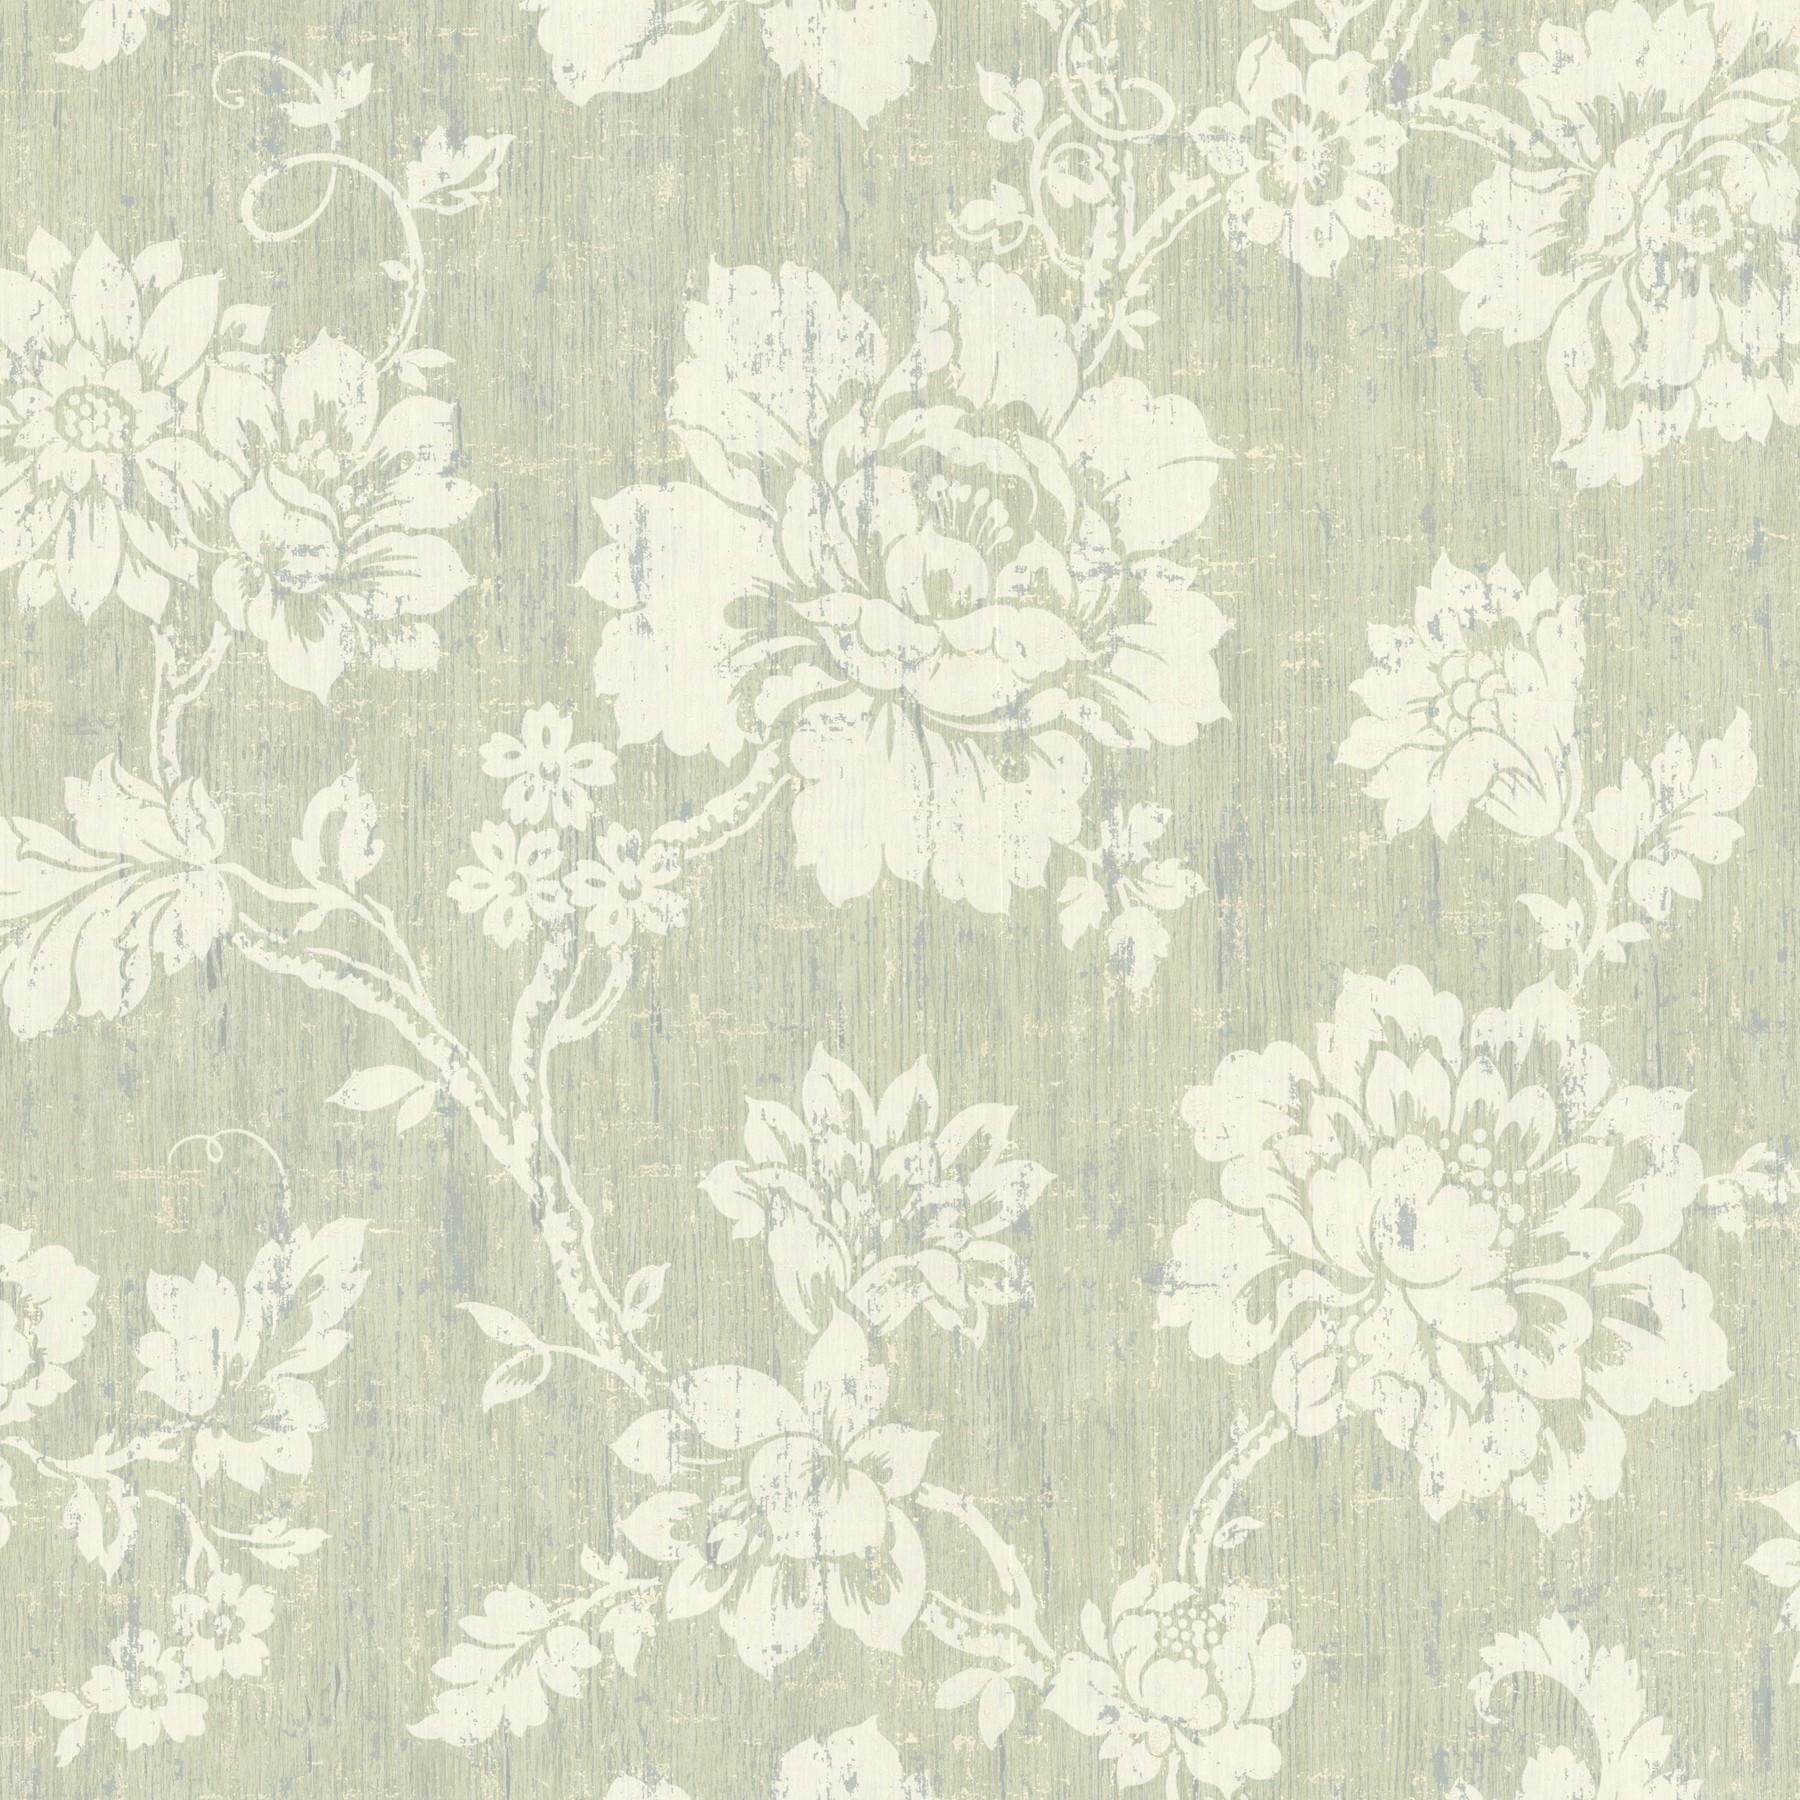 tapete onyx vliestapete rasch textil 020050 blumen gr n grau. Black Bedroom Furniture Sets. Home Design Ideas